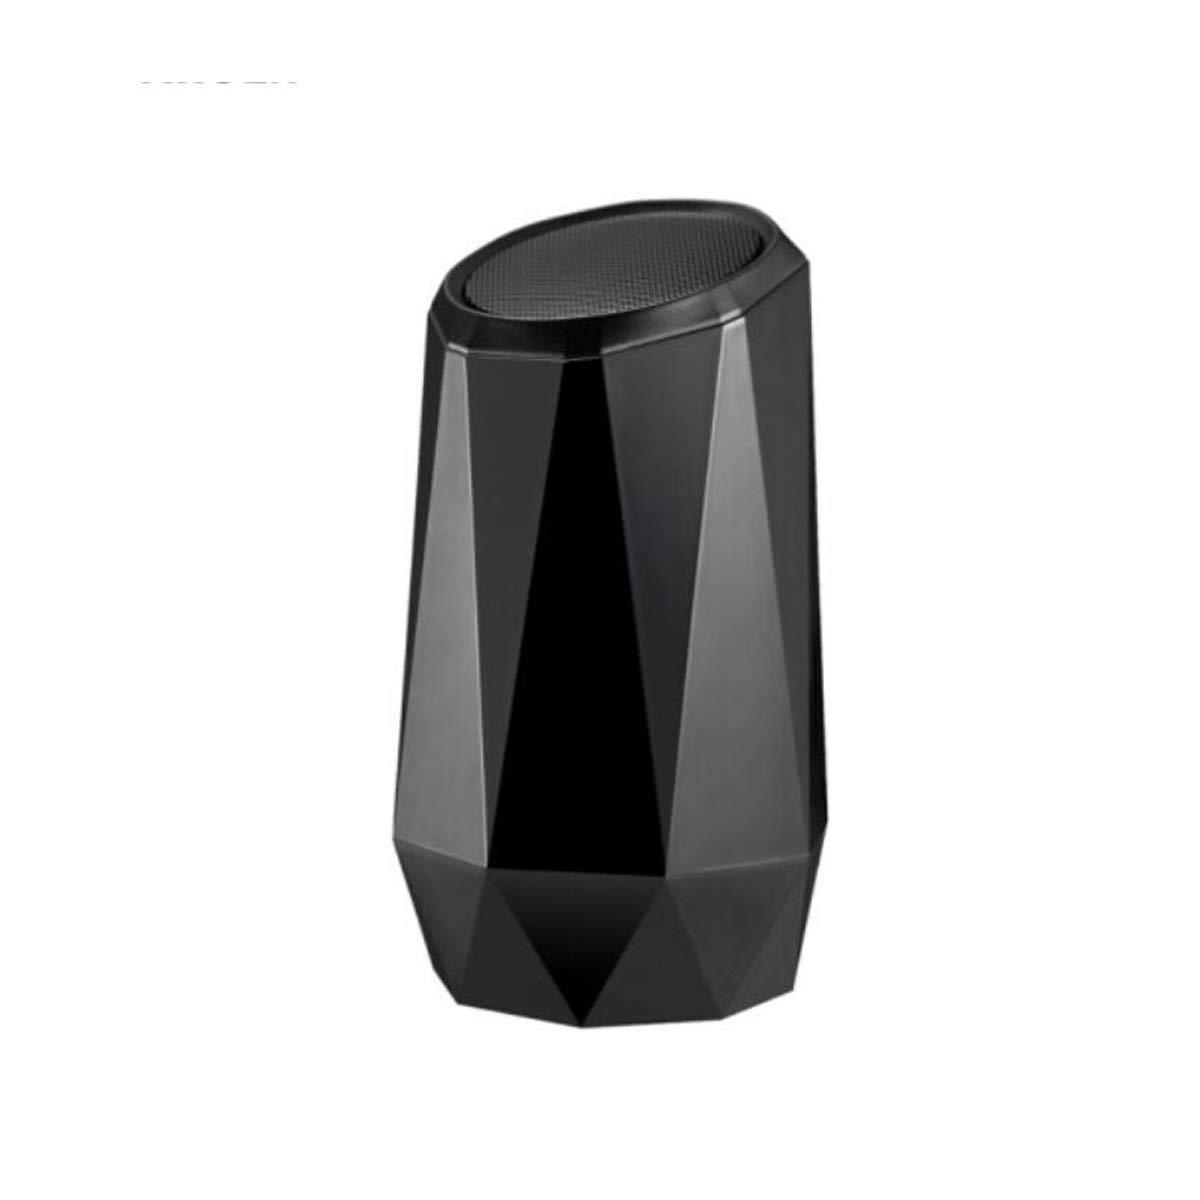 Aishanghuayi スピーカー、ブルートゥーススピーカークリスタルダイヤモンド、RGB呼吸光クリエイティブサウンド光源、ブラック 丈夫な (Color : Black)   B07RHRXFMH